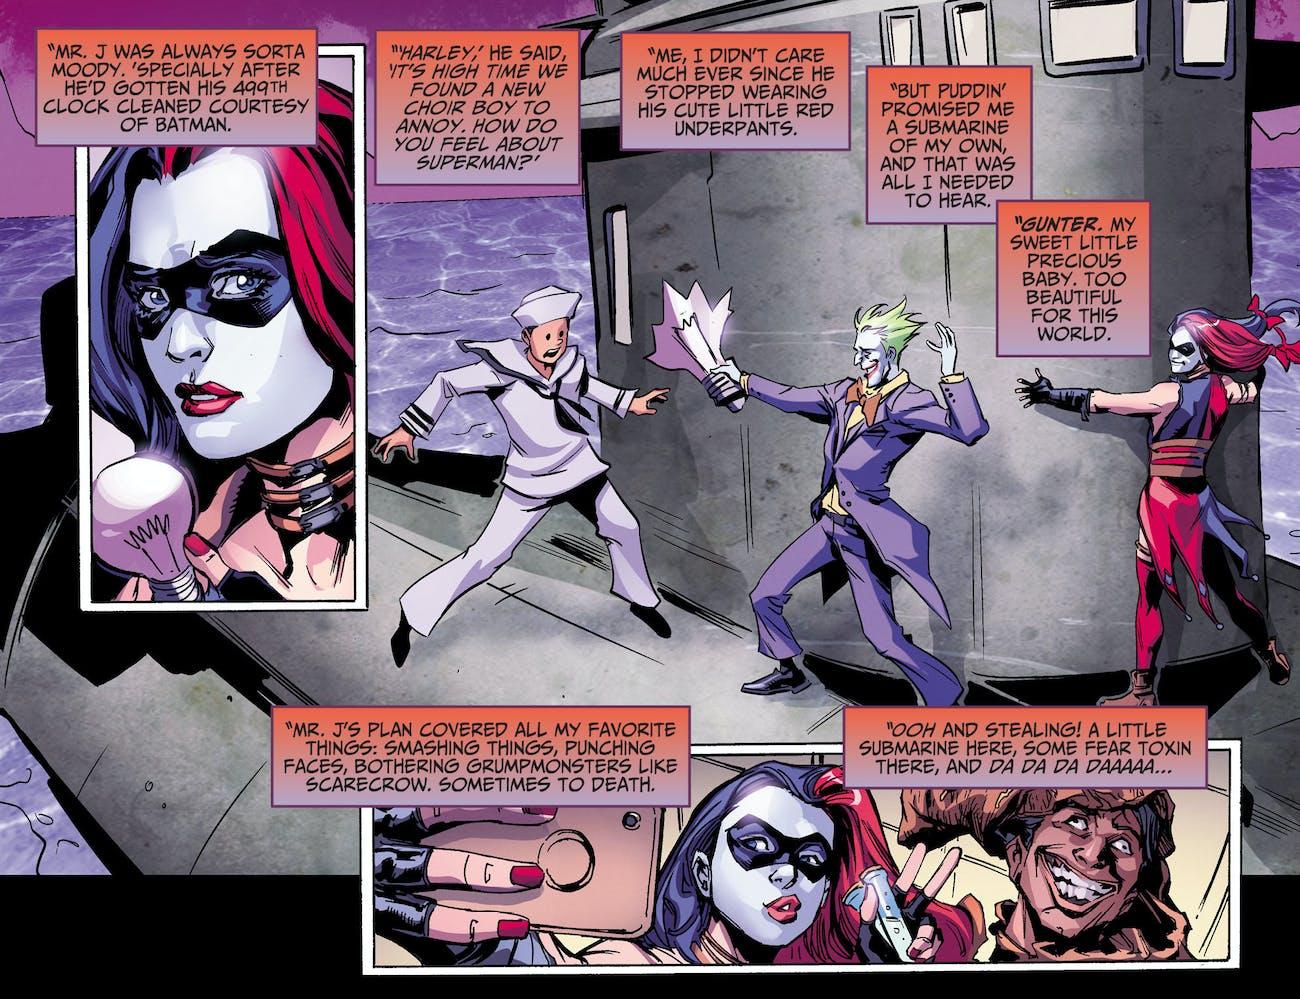 DC Injustice Harley Quinn Ground Zero Comic